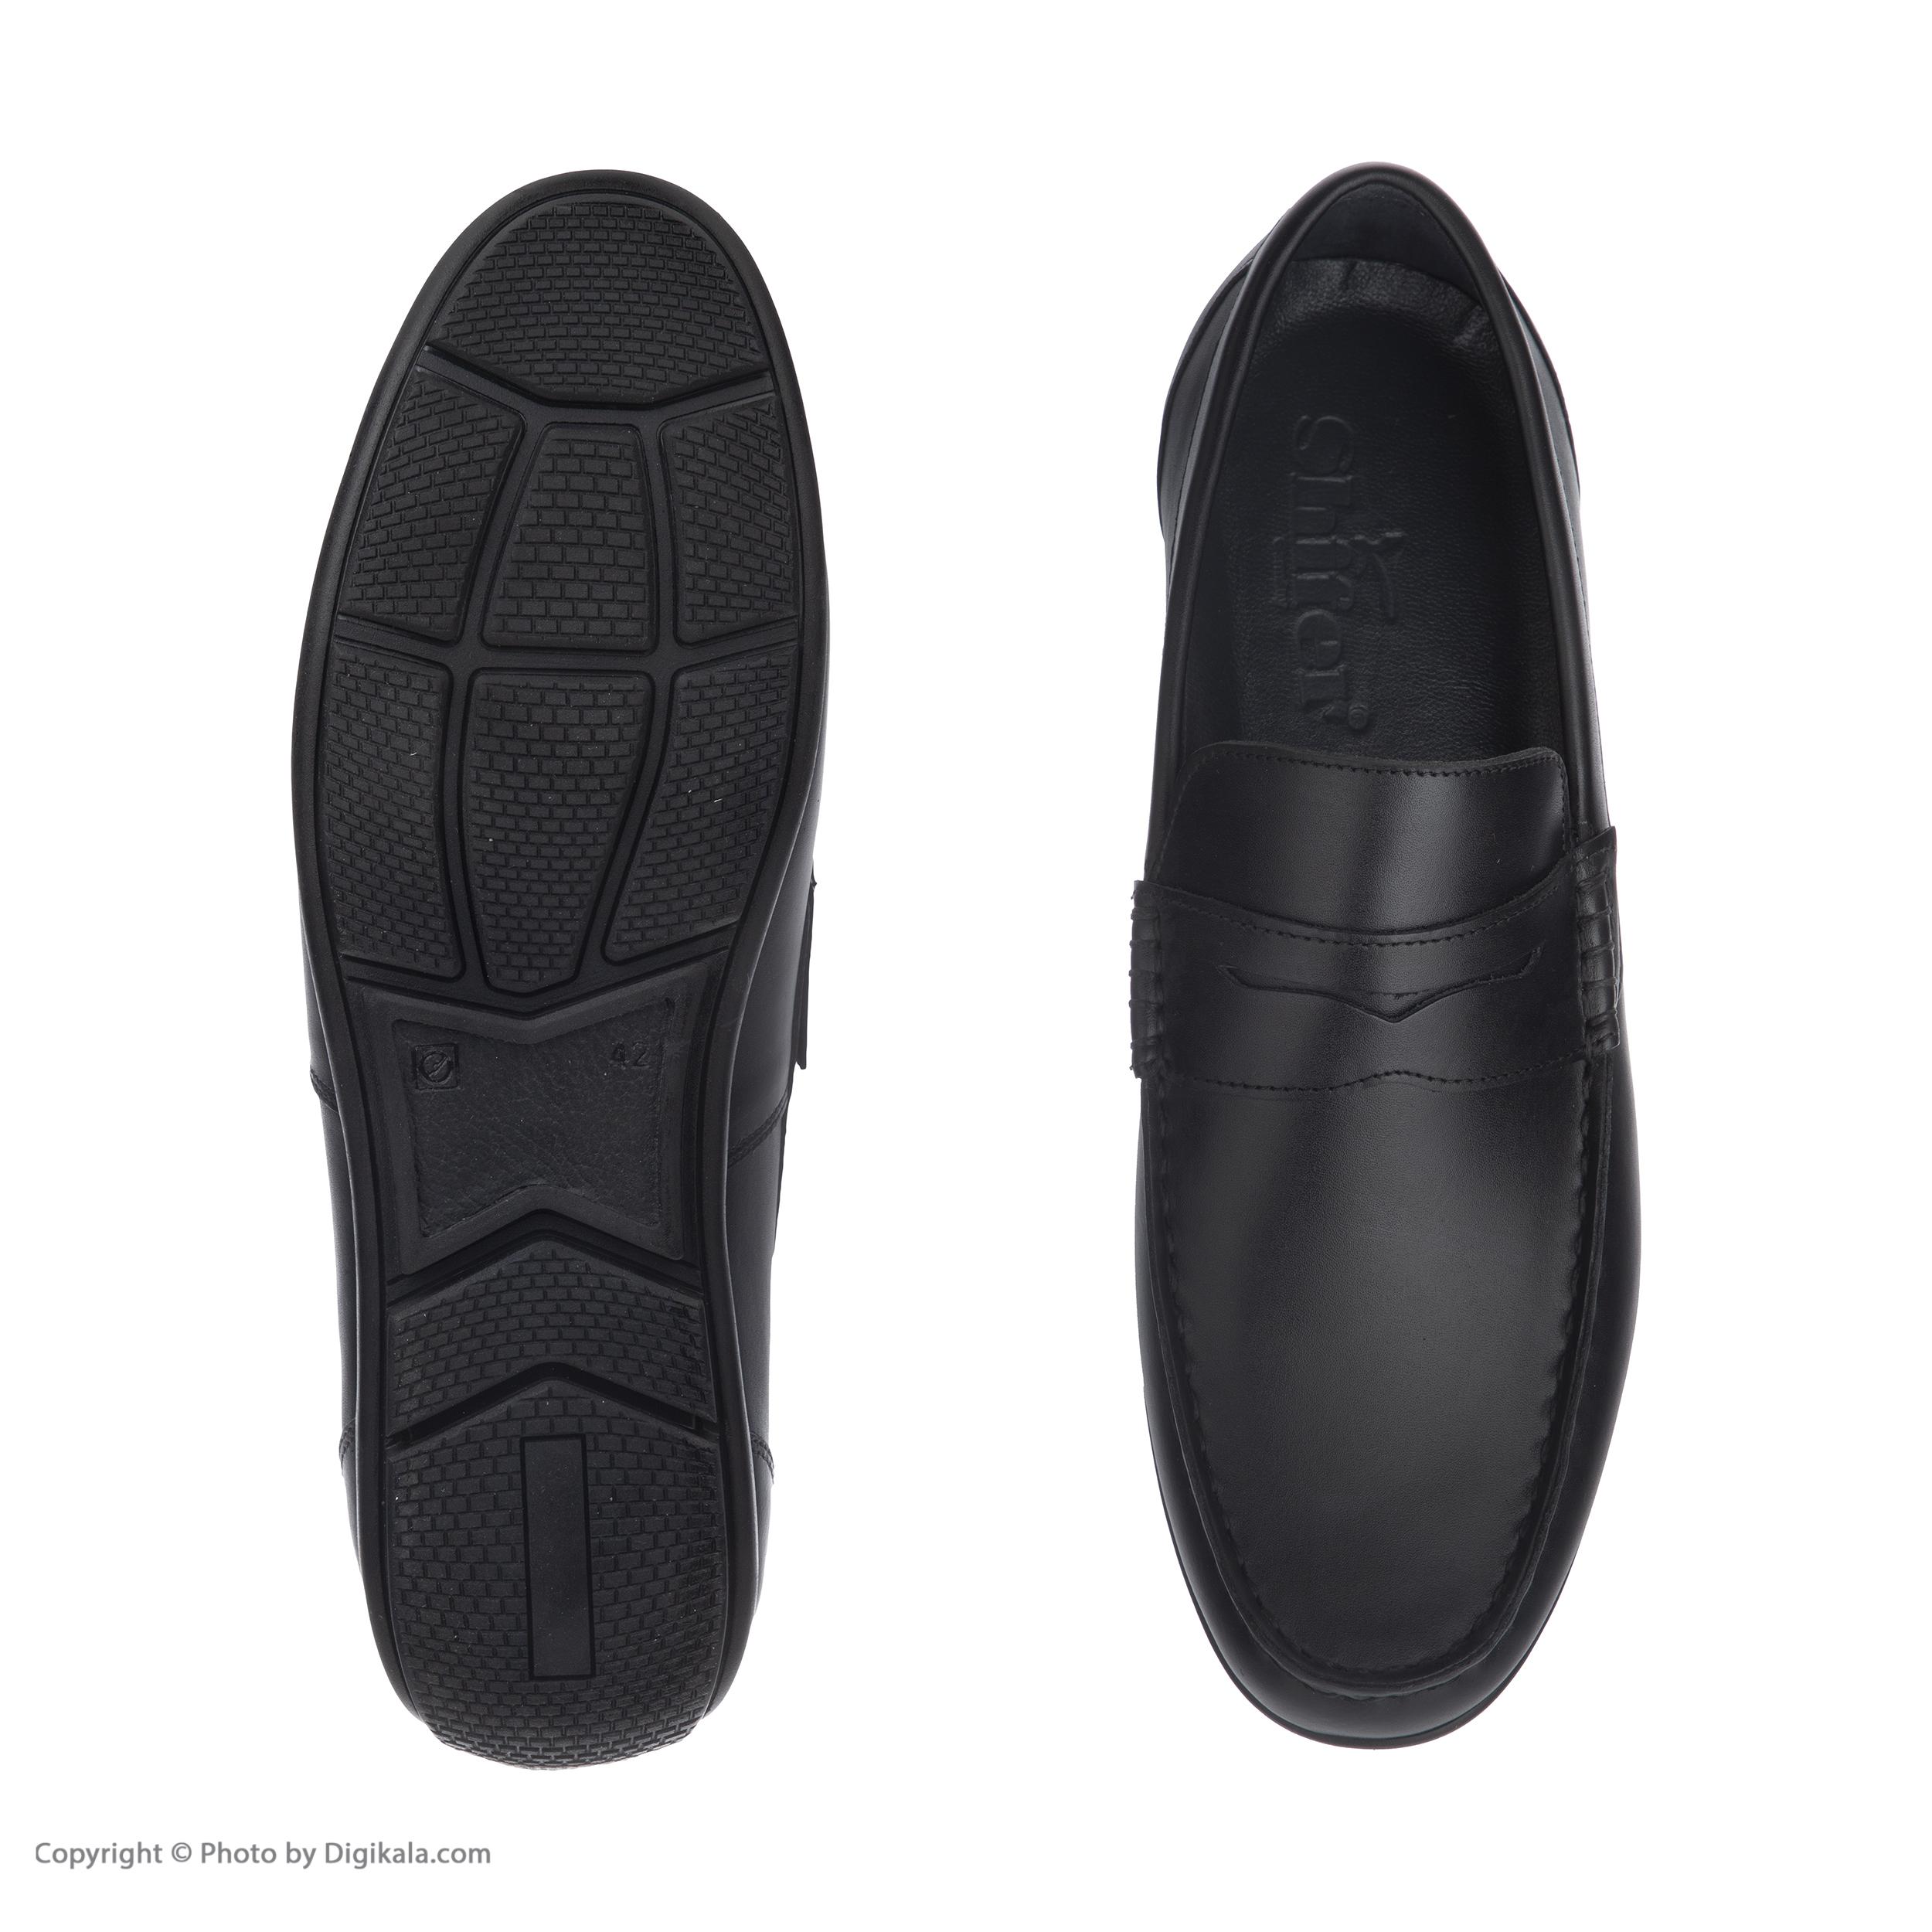 خرید                                     کفش روزمره مردانه شیفر مدل 7306A